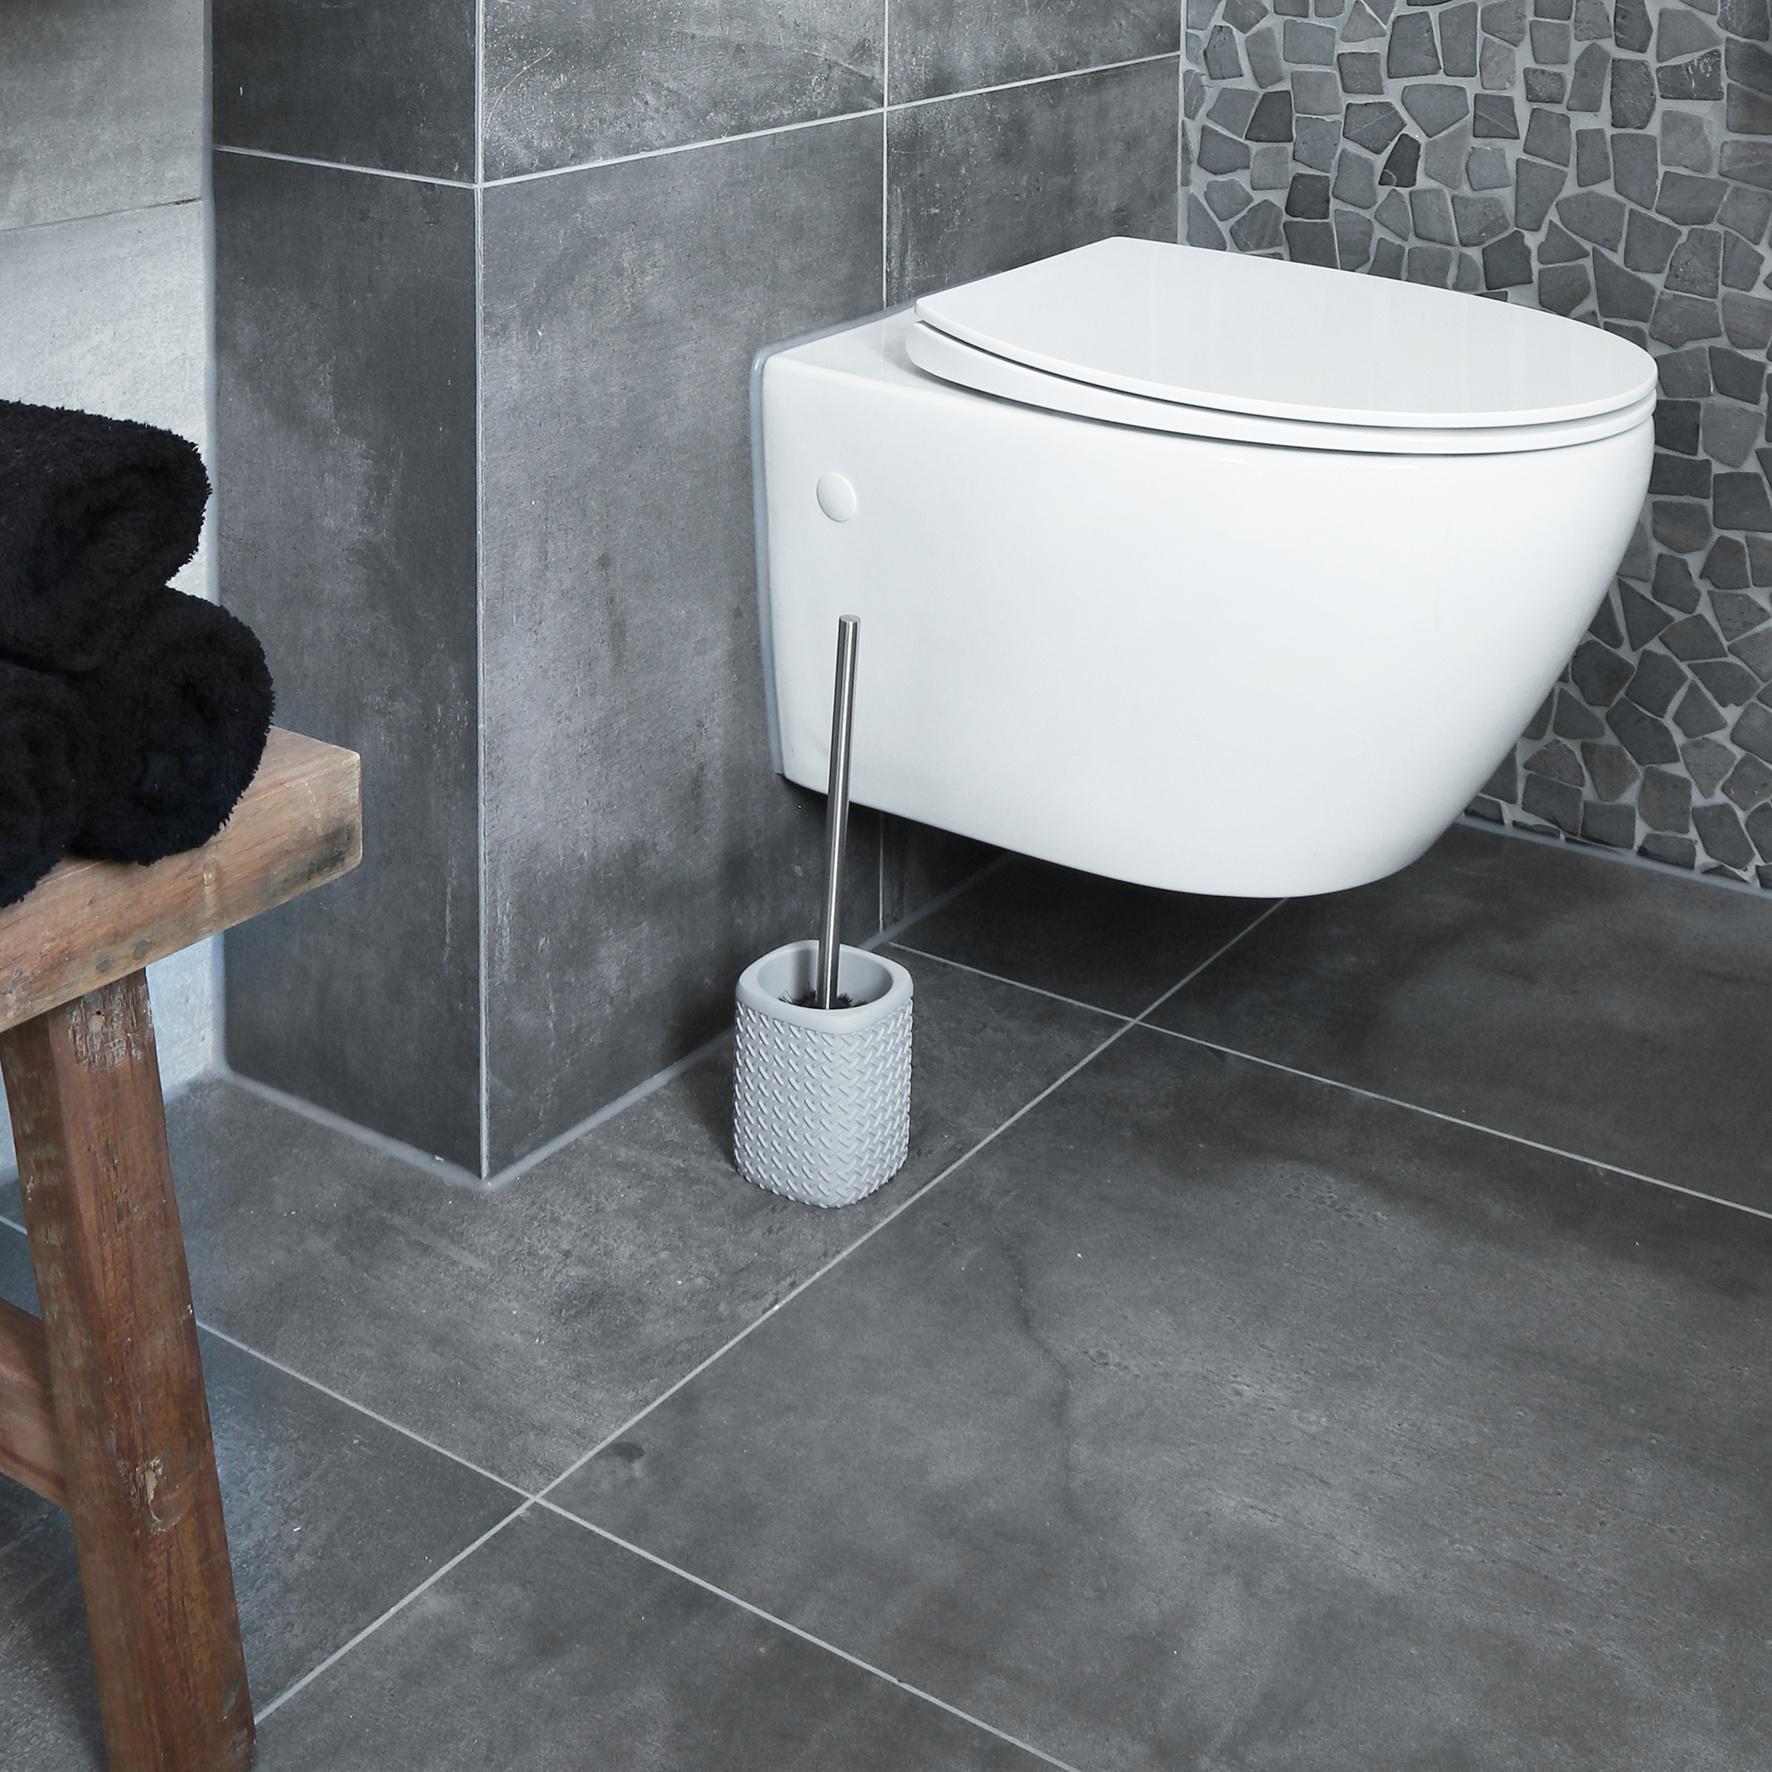 Accessoires Set Toilet Badkamer Grijs Wafel-7